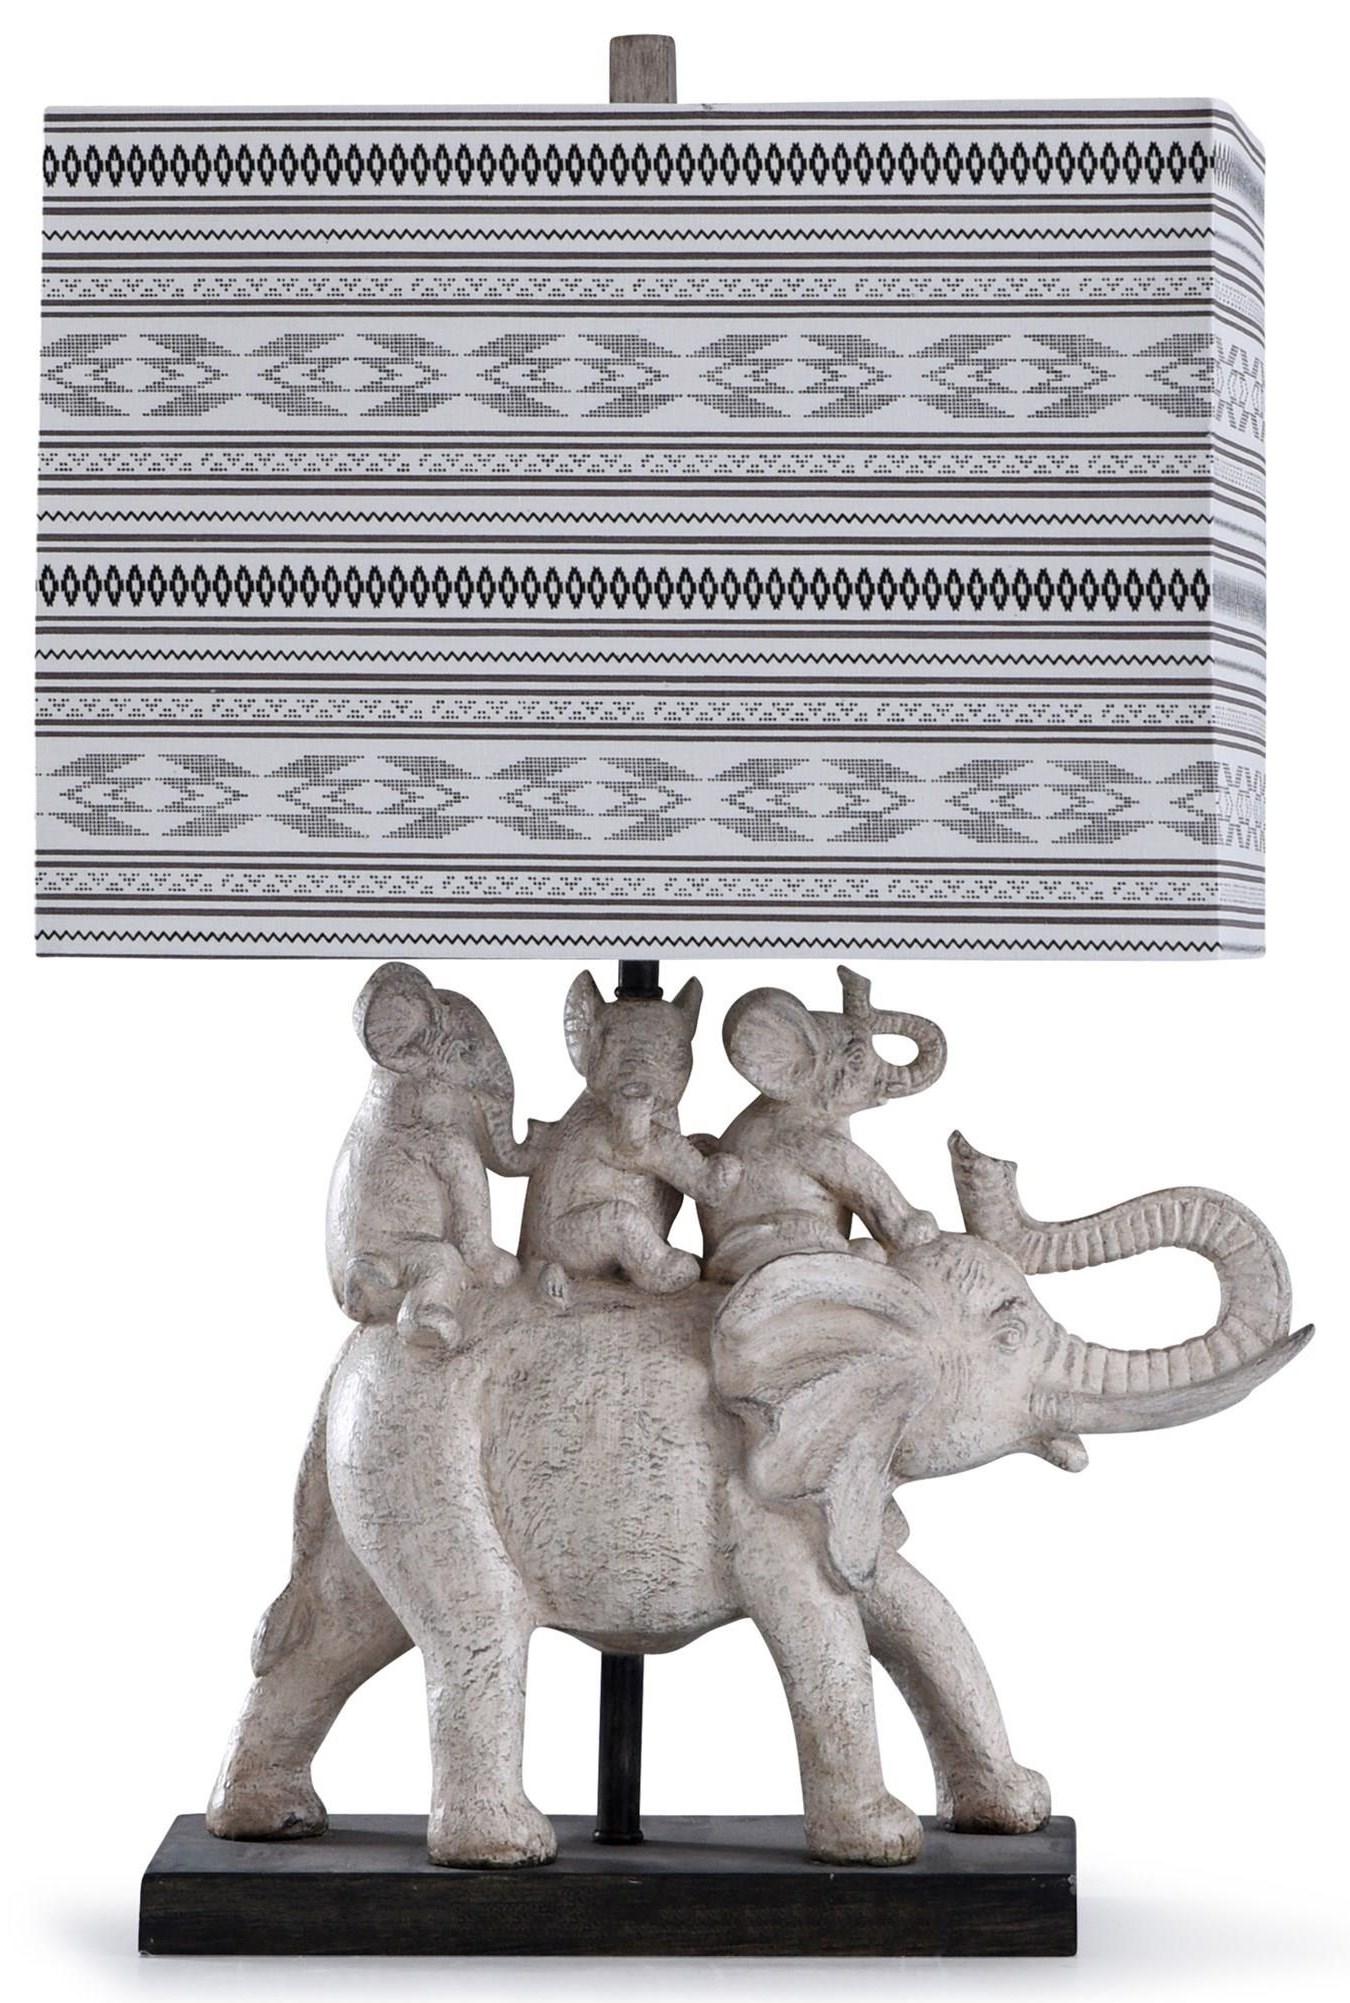 2020 LAMPS Elephant Lamp by StyleCraft at Furniture Fair - North Carolina